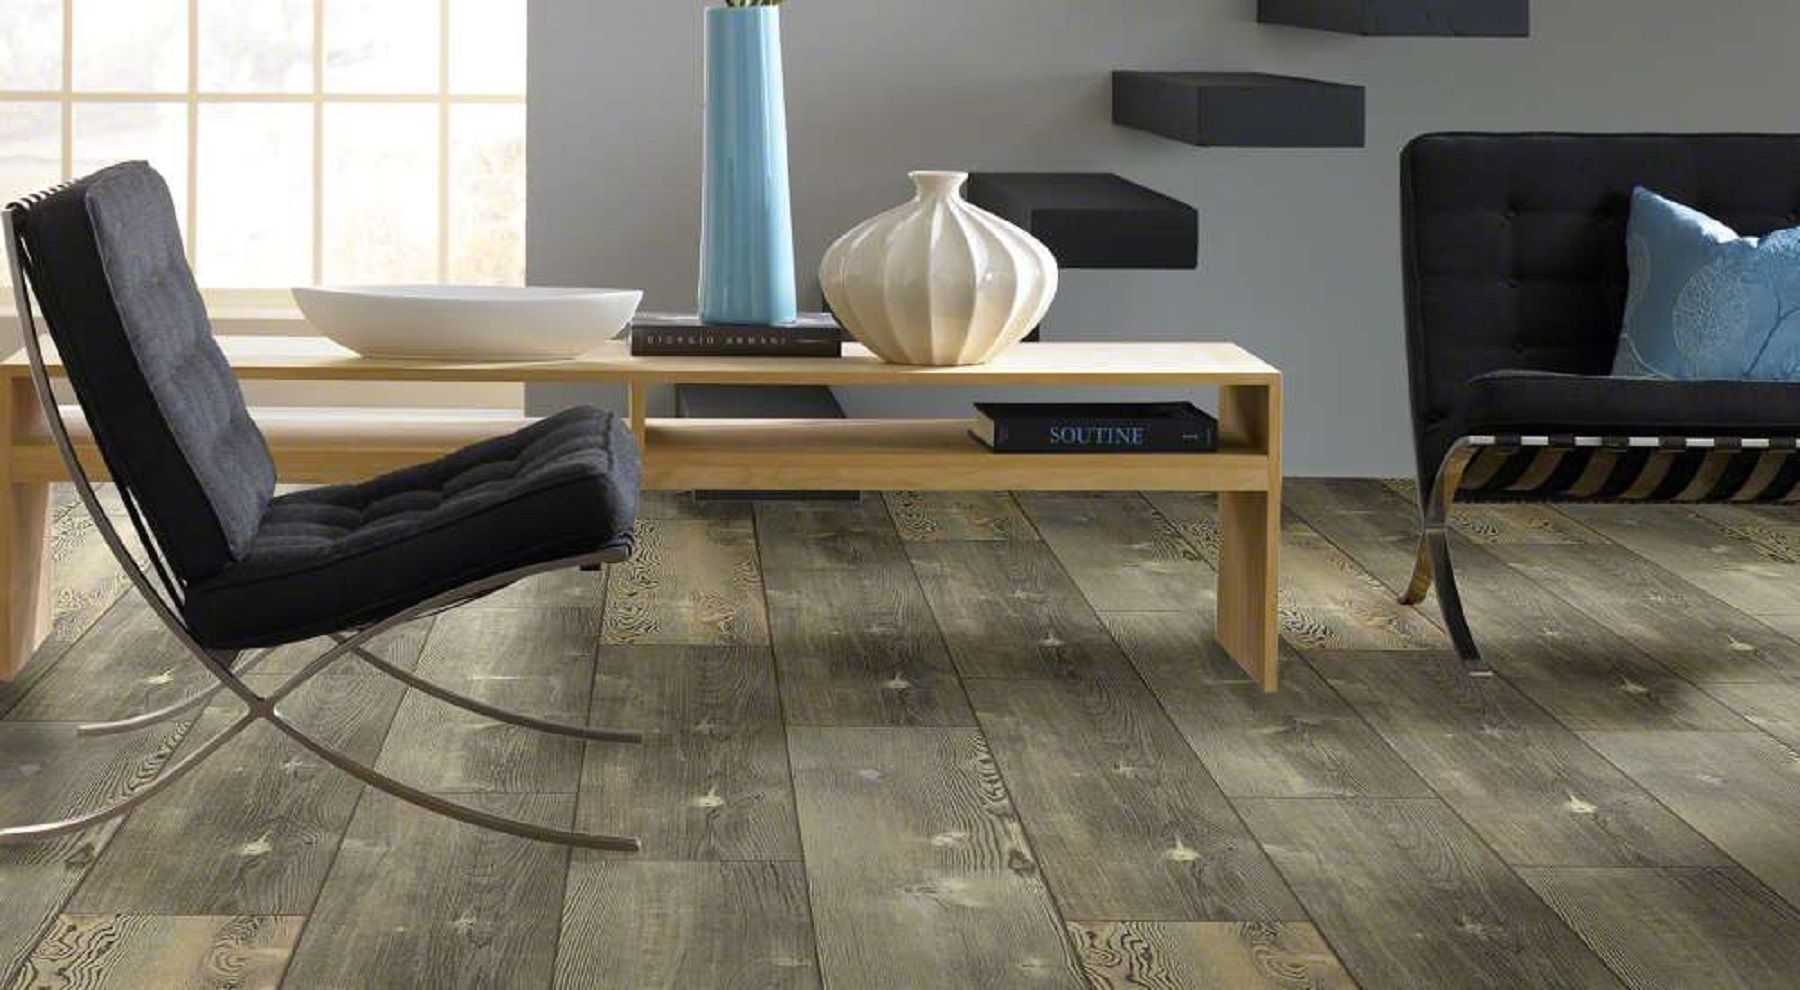 Shaw Luxury Vinyl Plank Flooring Lines